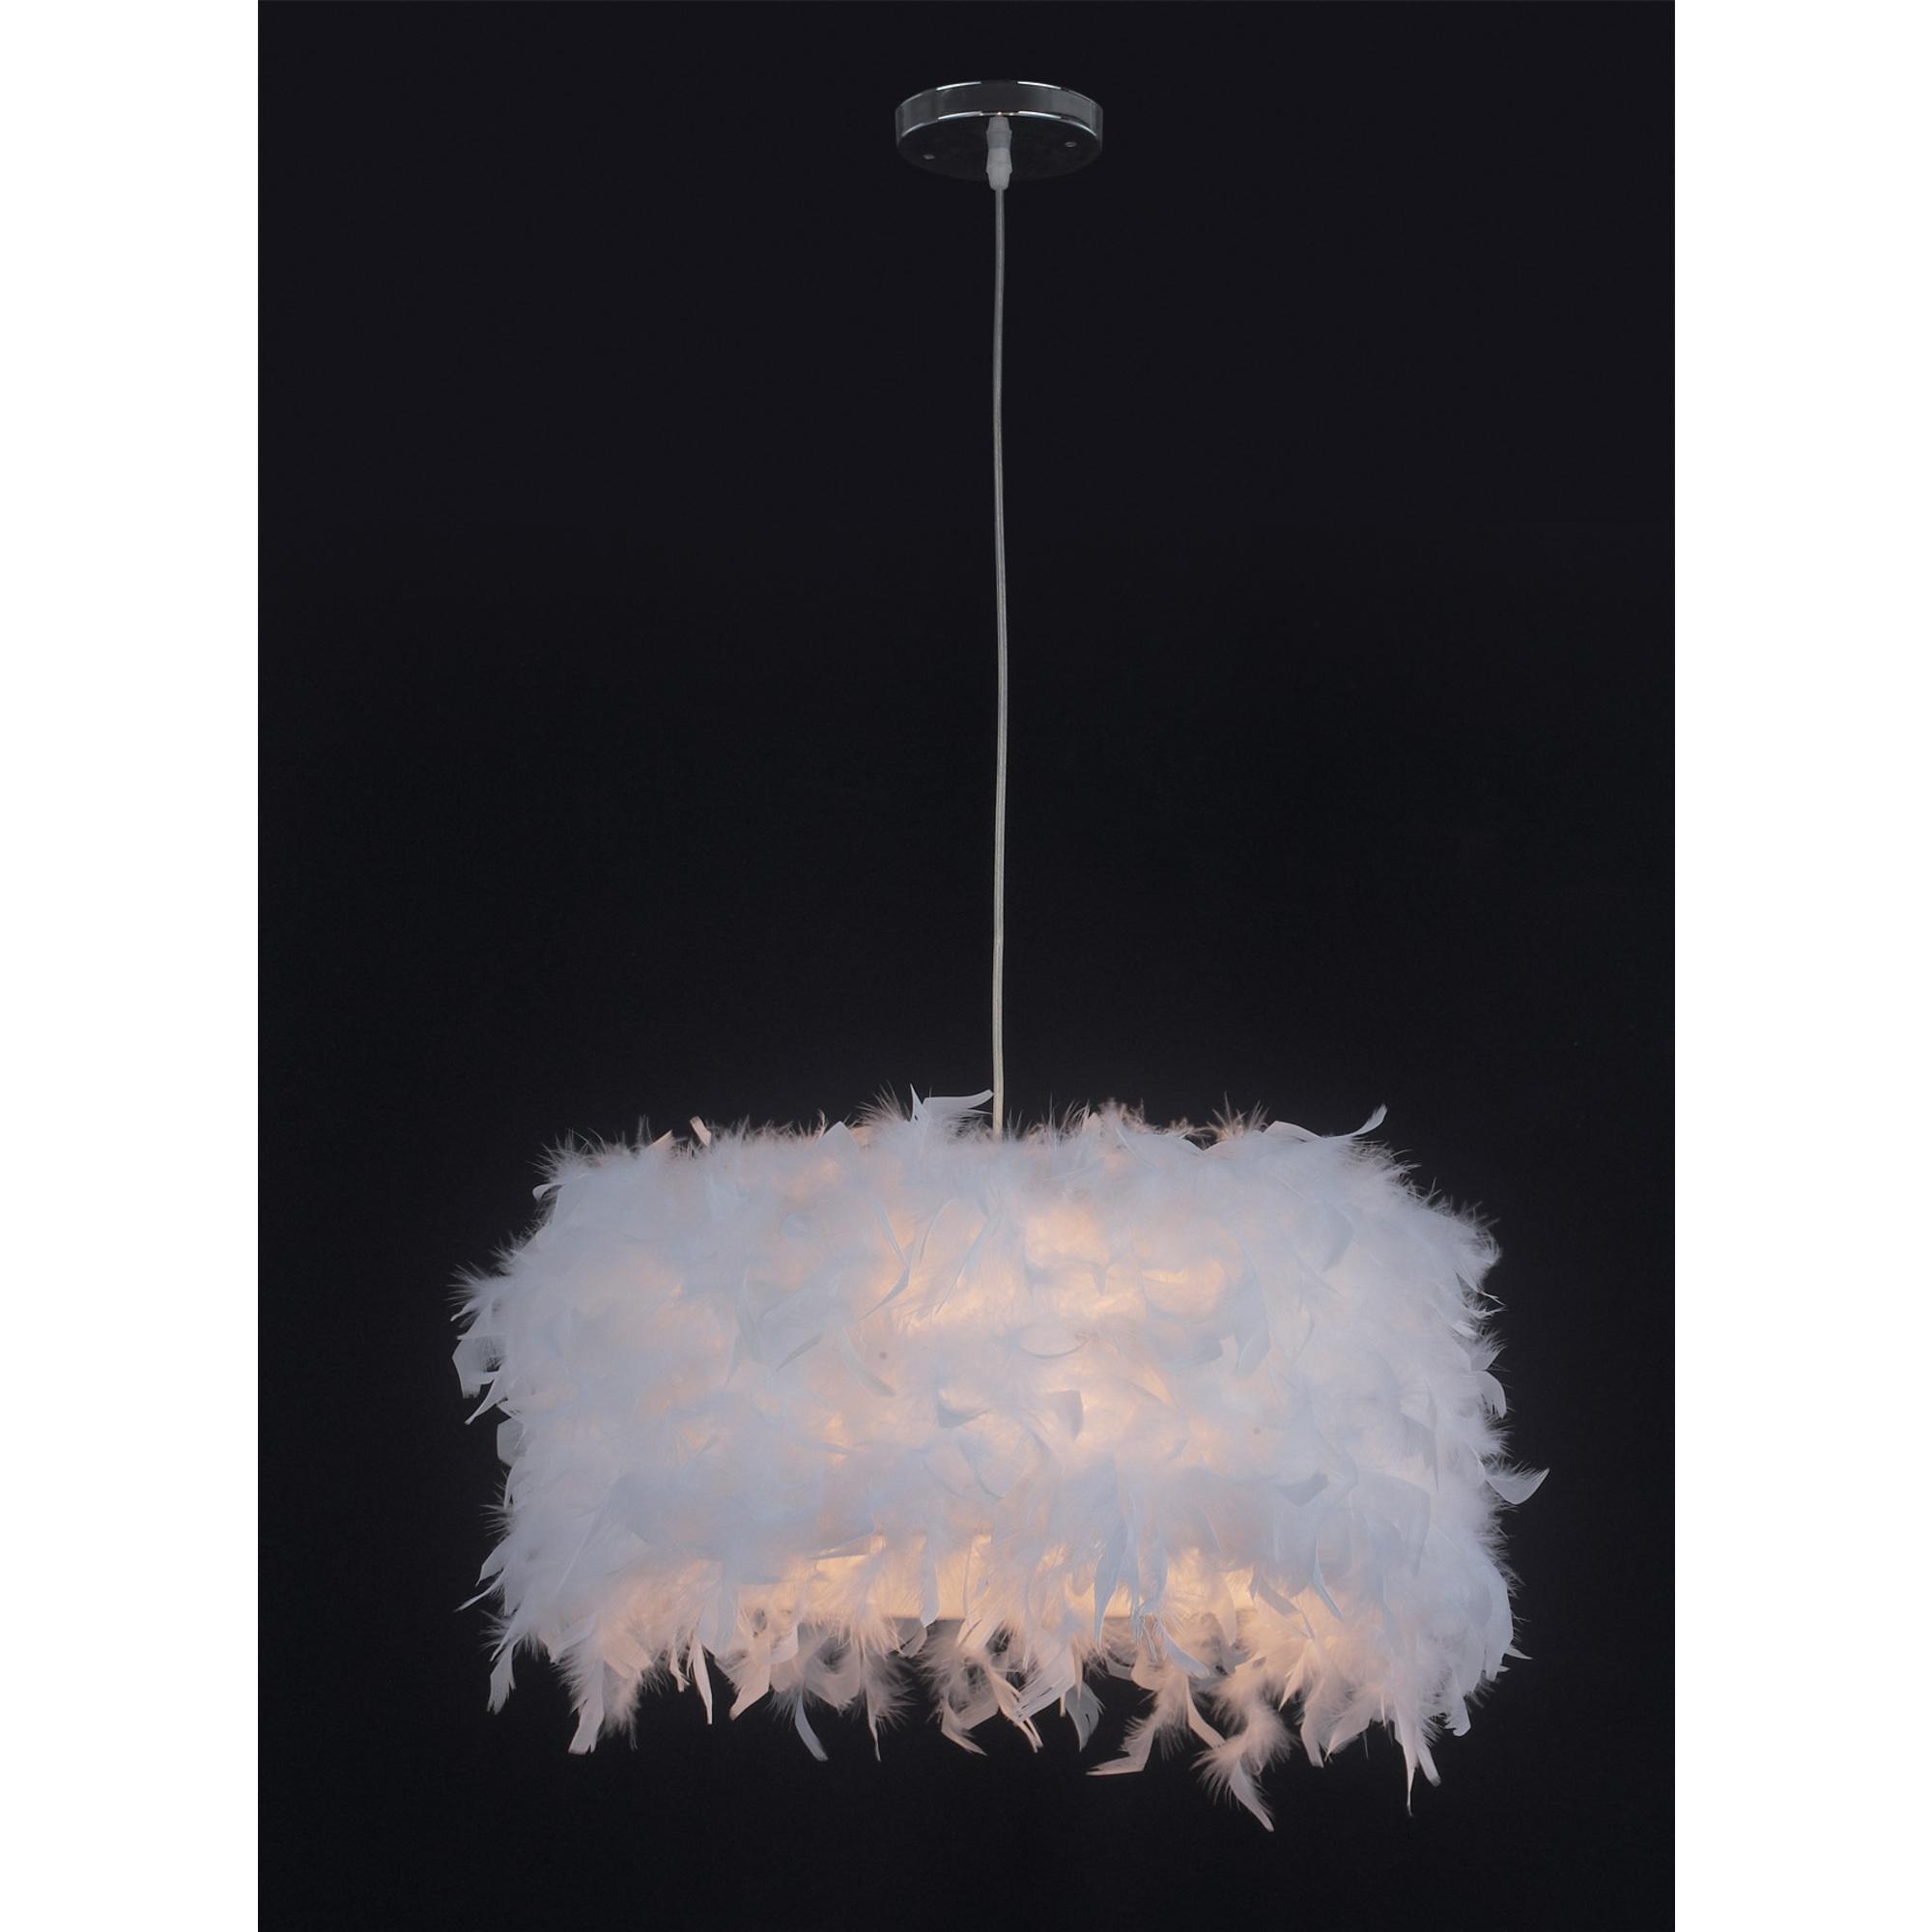 Feather Pendant Light - White